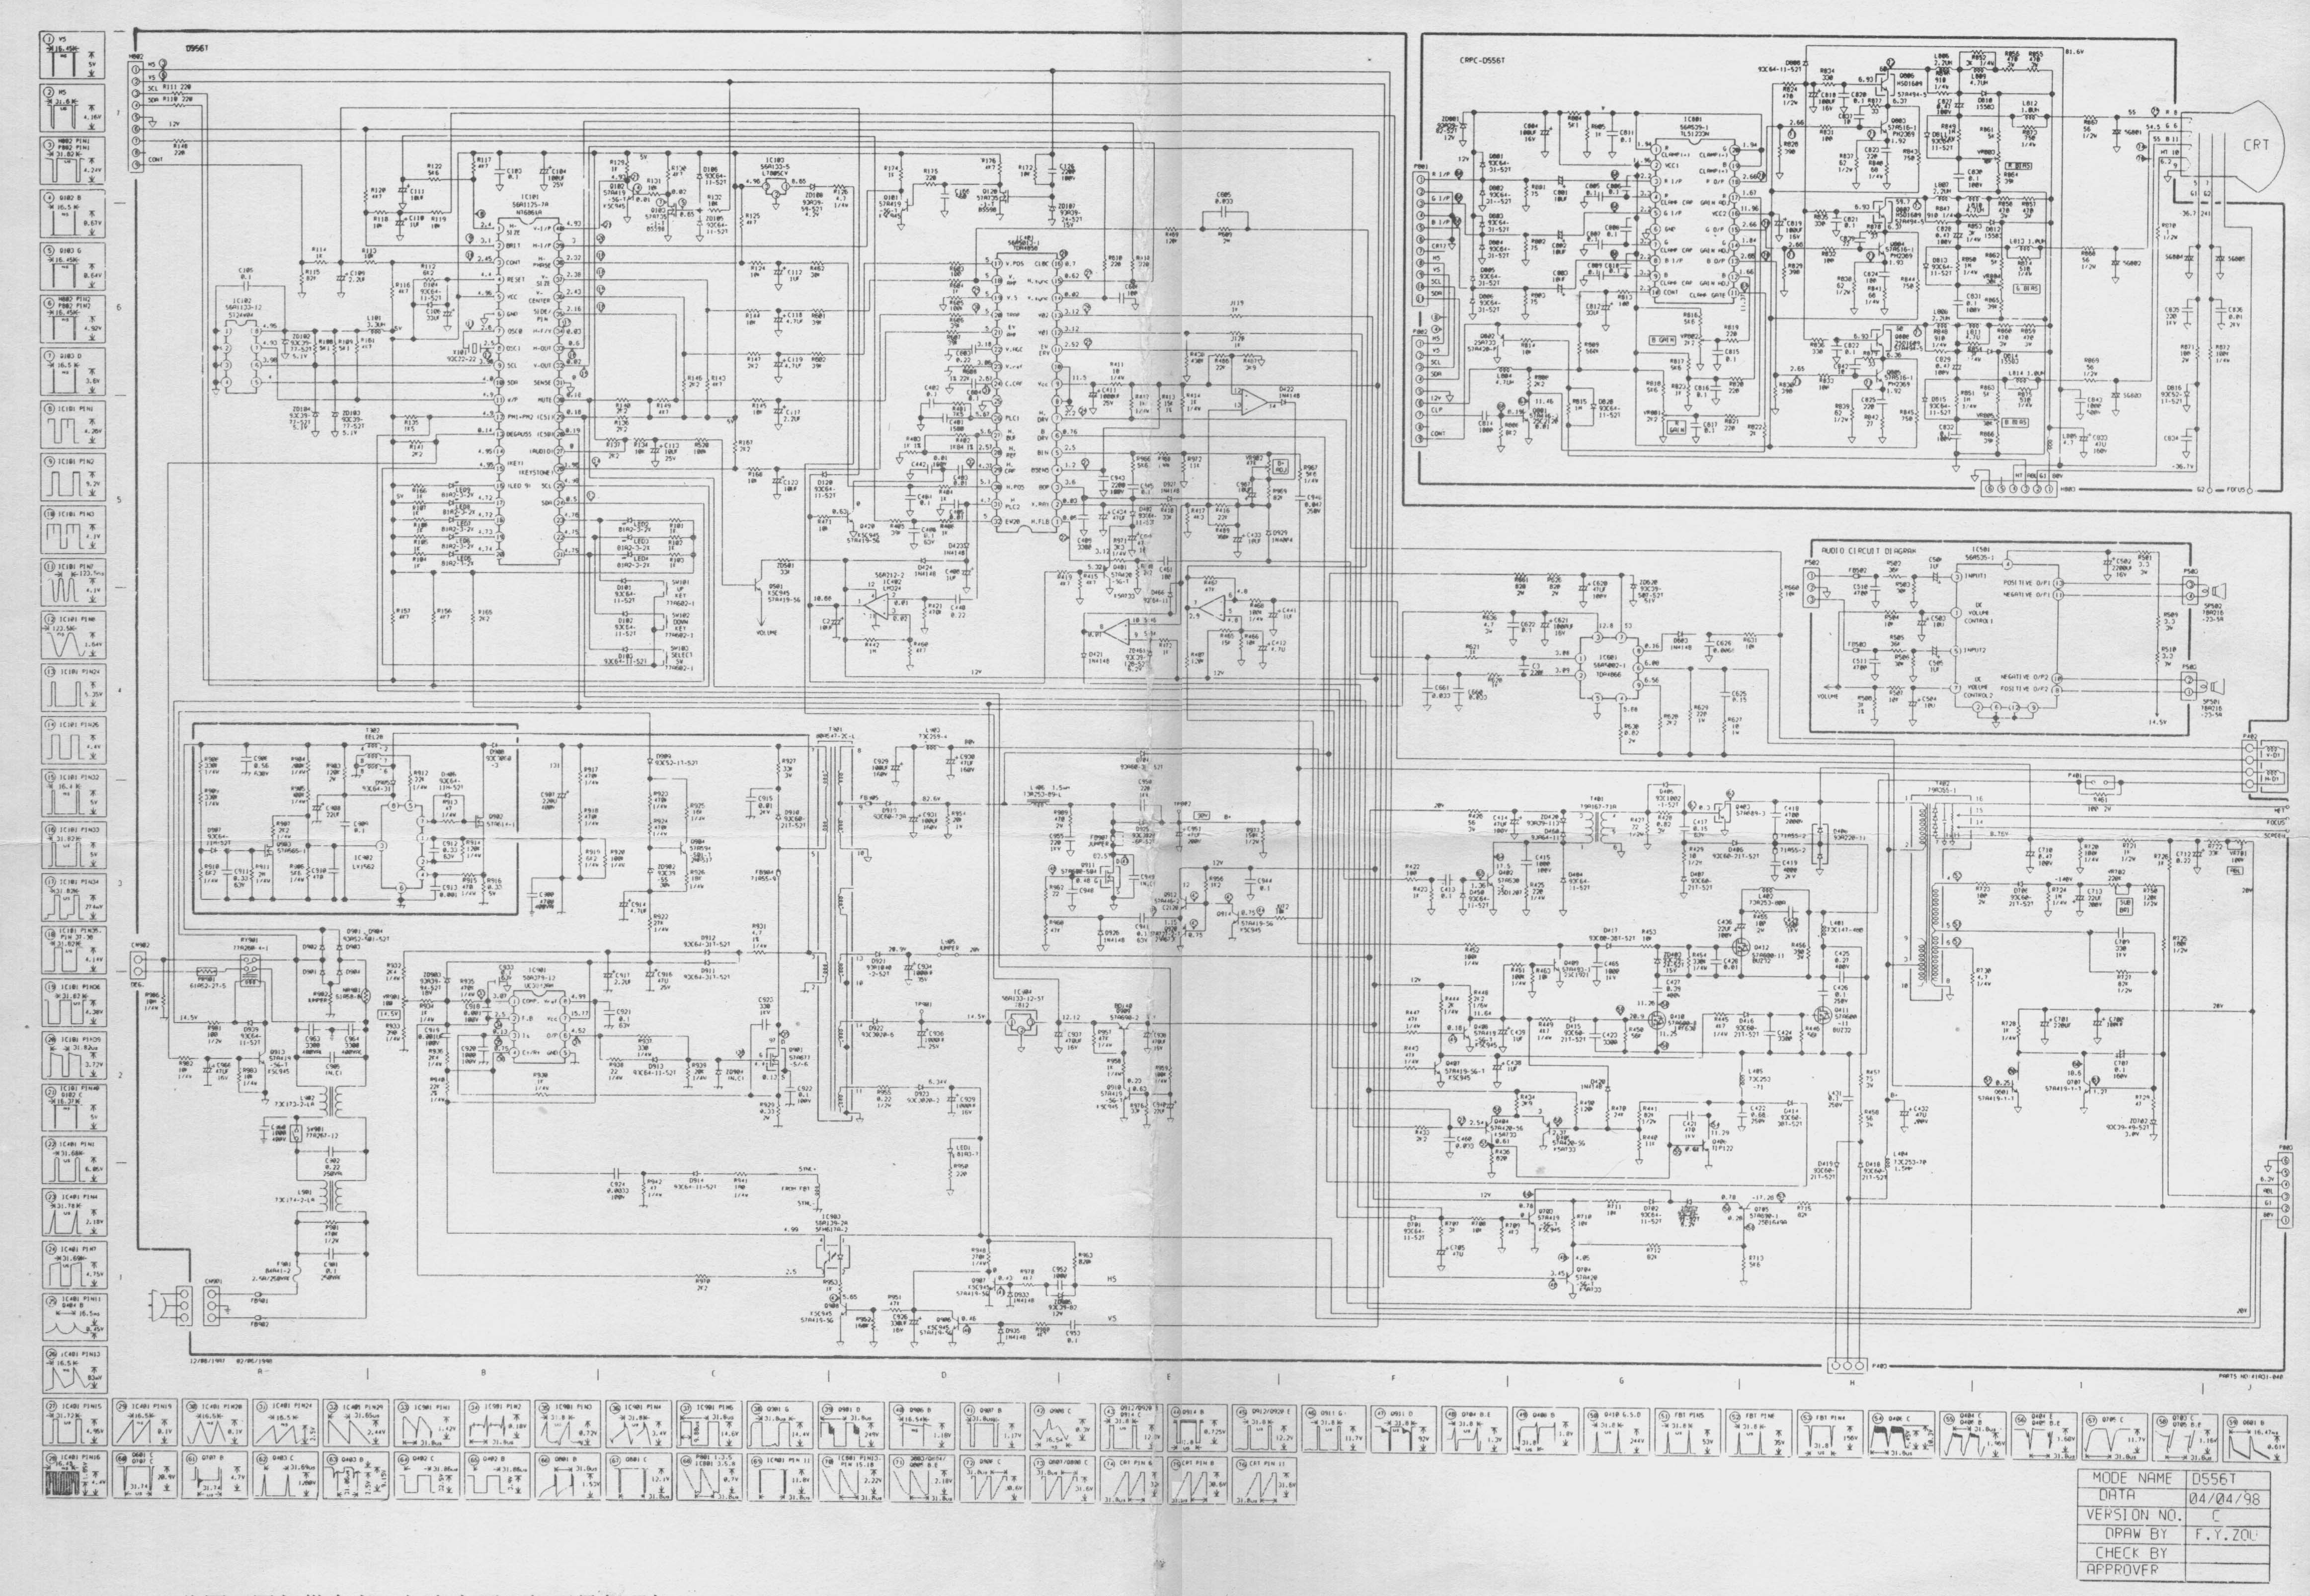 Crown Sc 4000 Service Manual Forklift Wiring Diagram